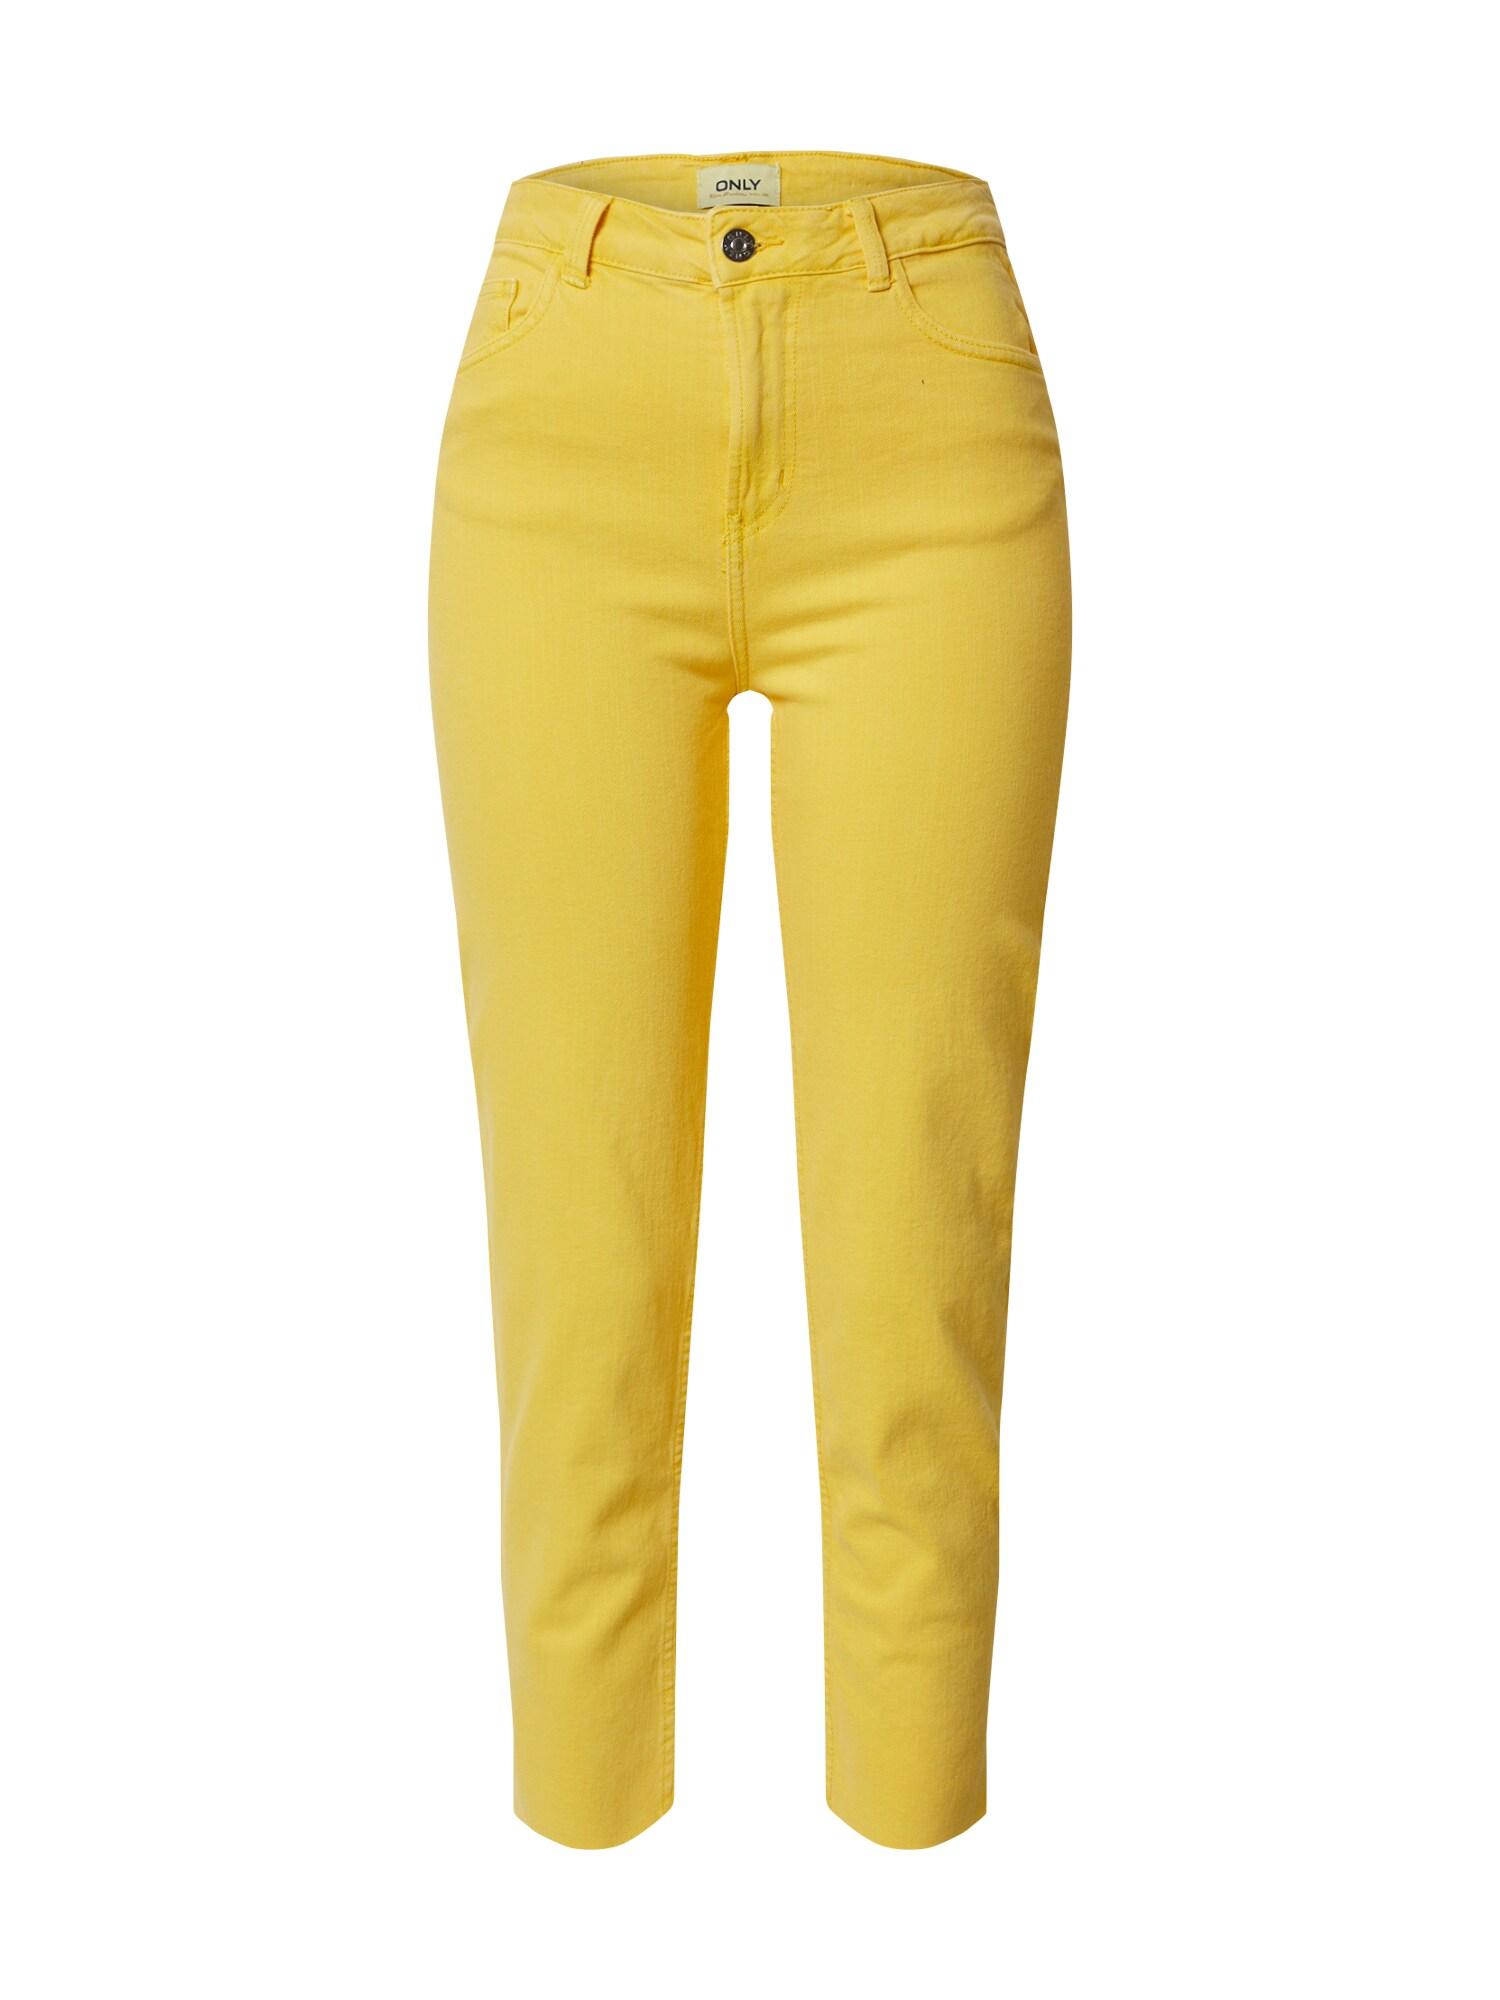 ONLY Džínsy  žlté